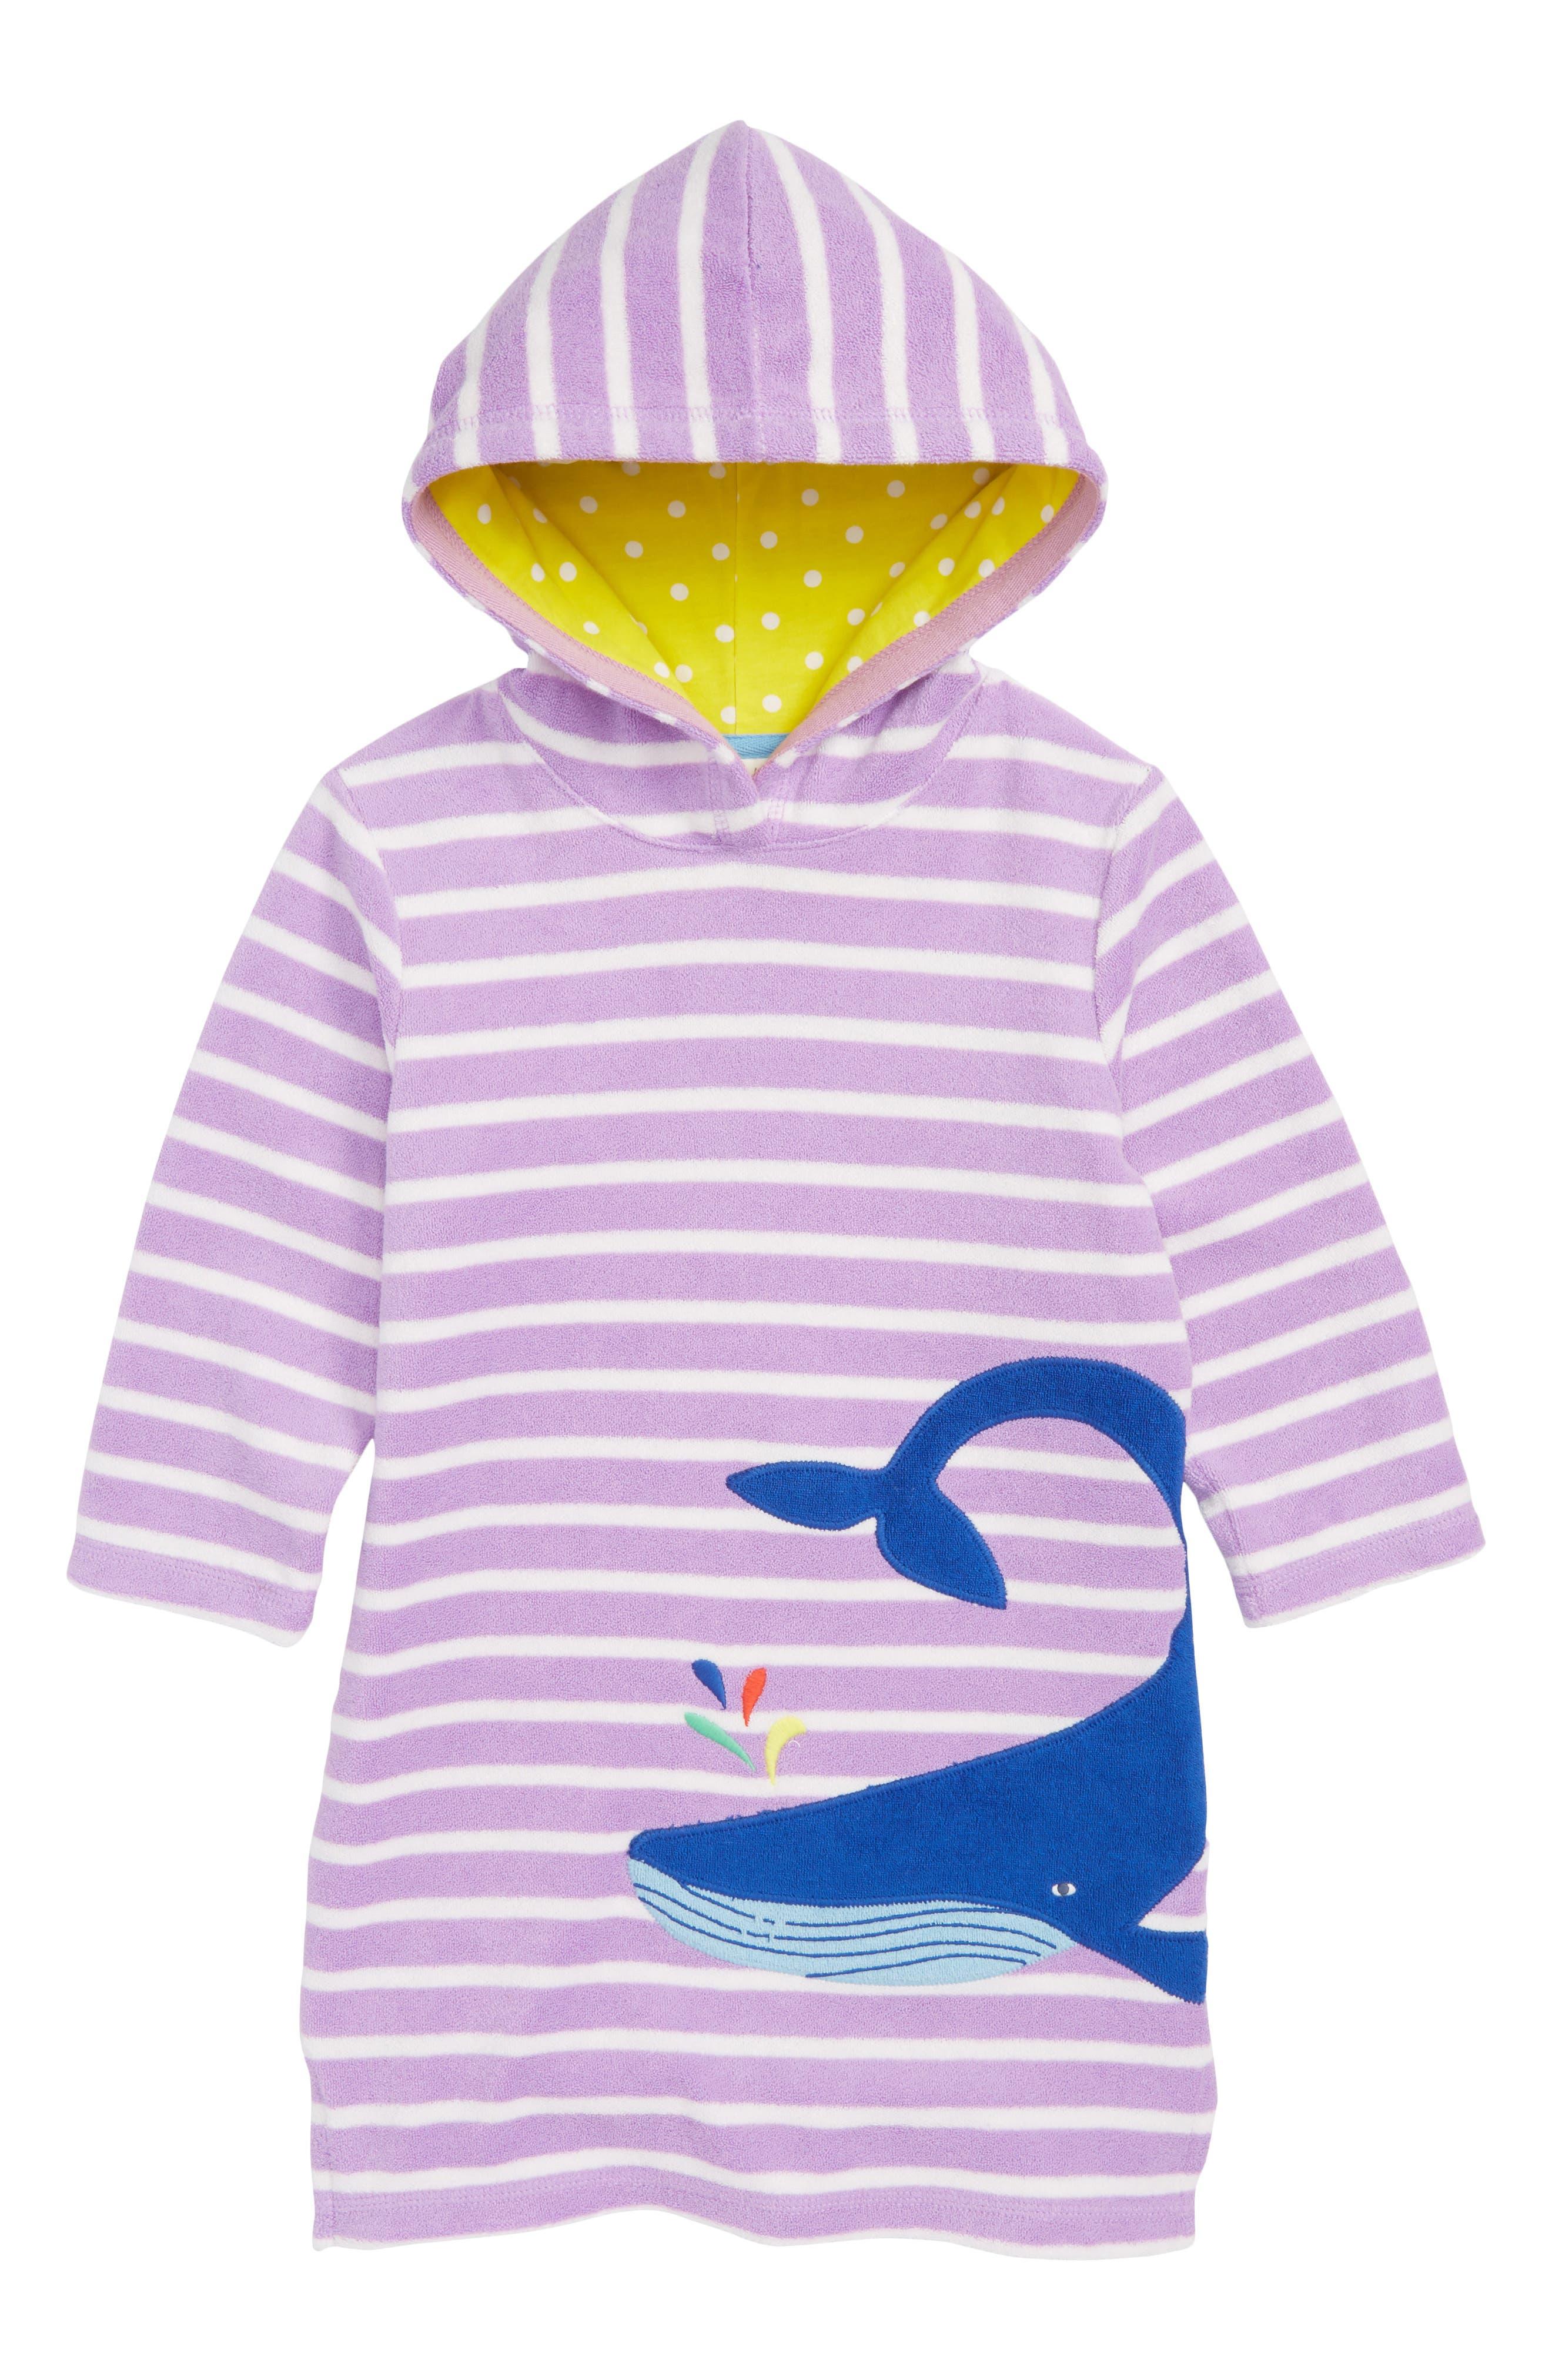 Appliqué Hooded Toweling Beach Dress,                             Main thumbnail 1, color,                             Lavender/ Ivory